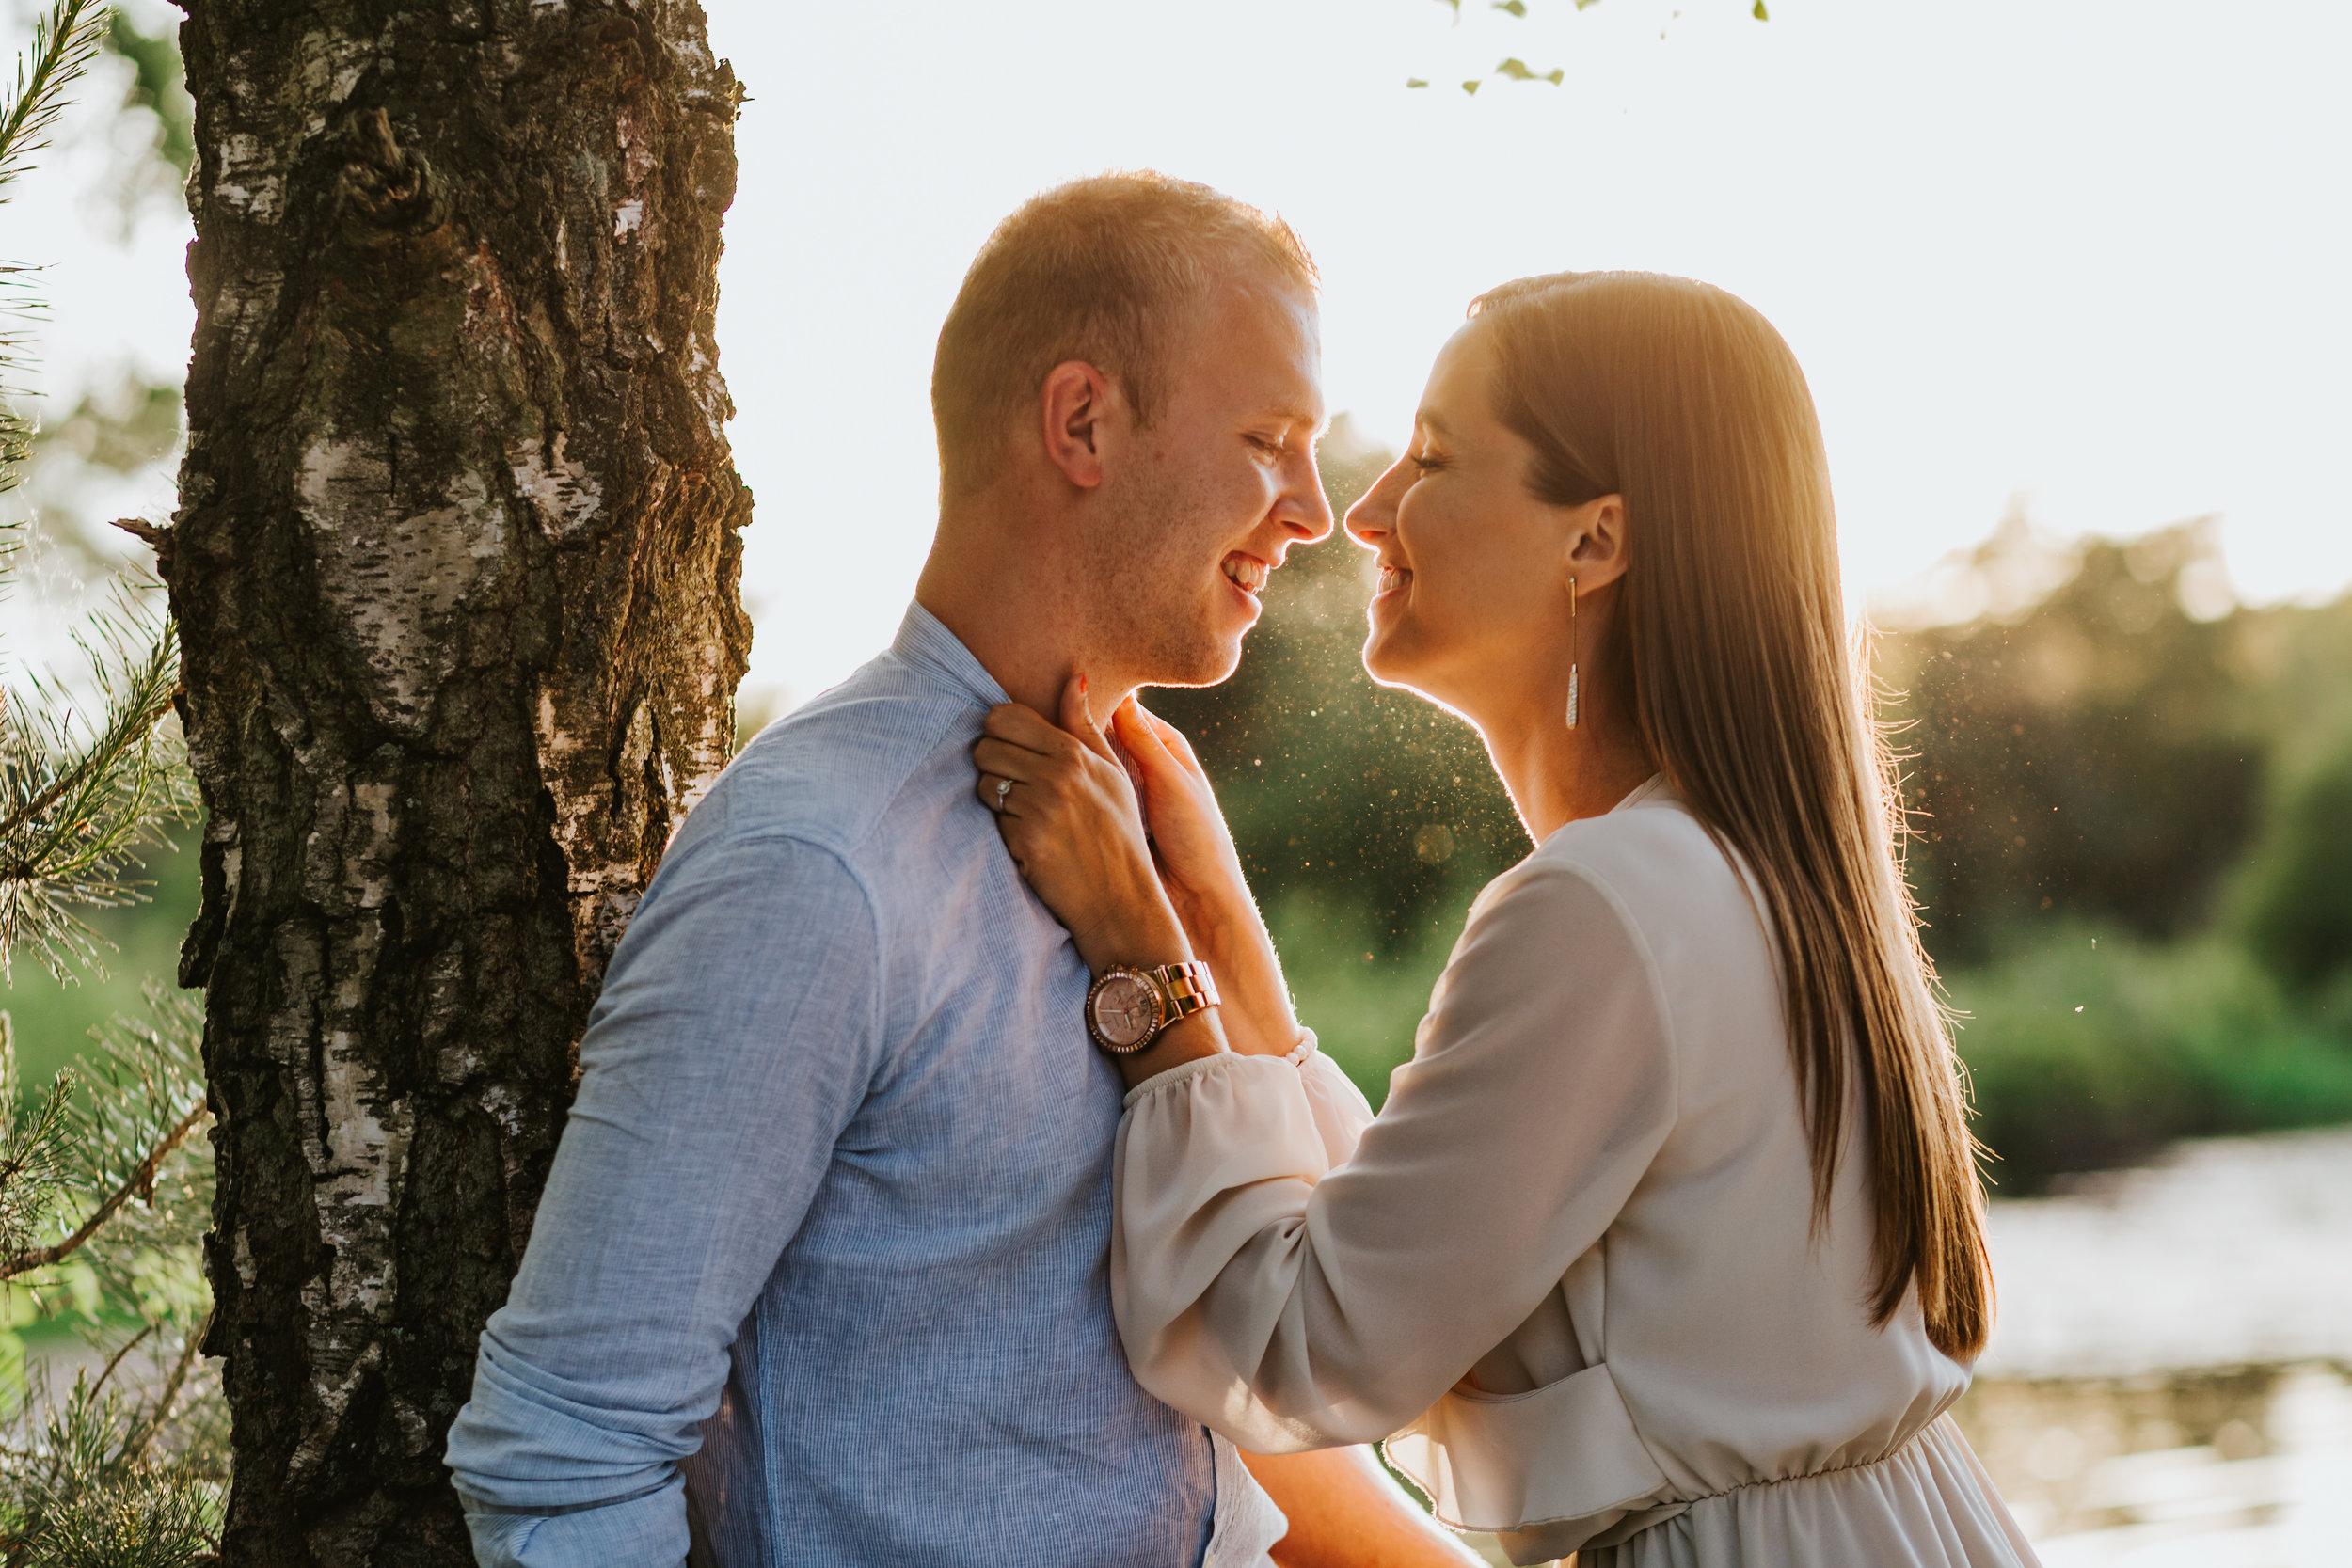 Carolien & Stijn - Love shoot - 1 juni 2019